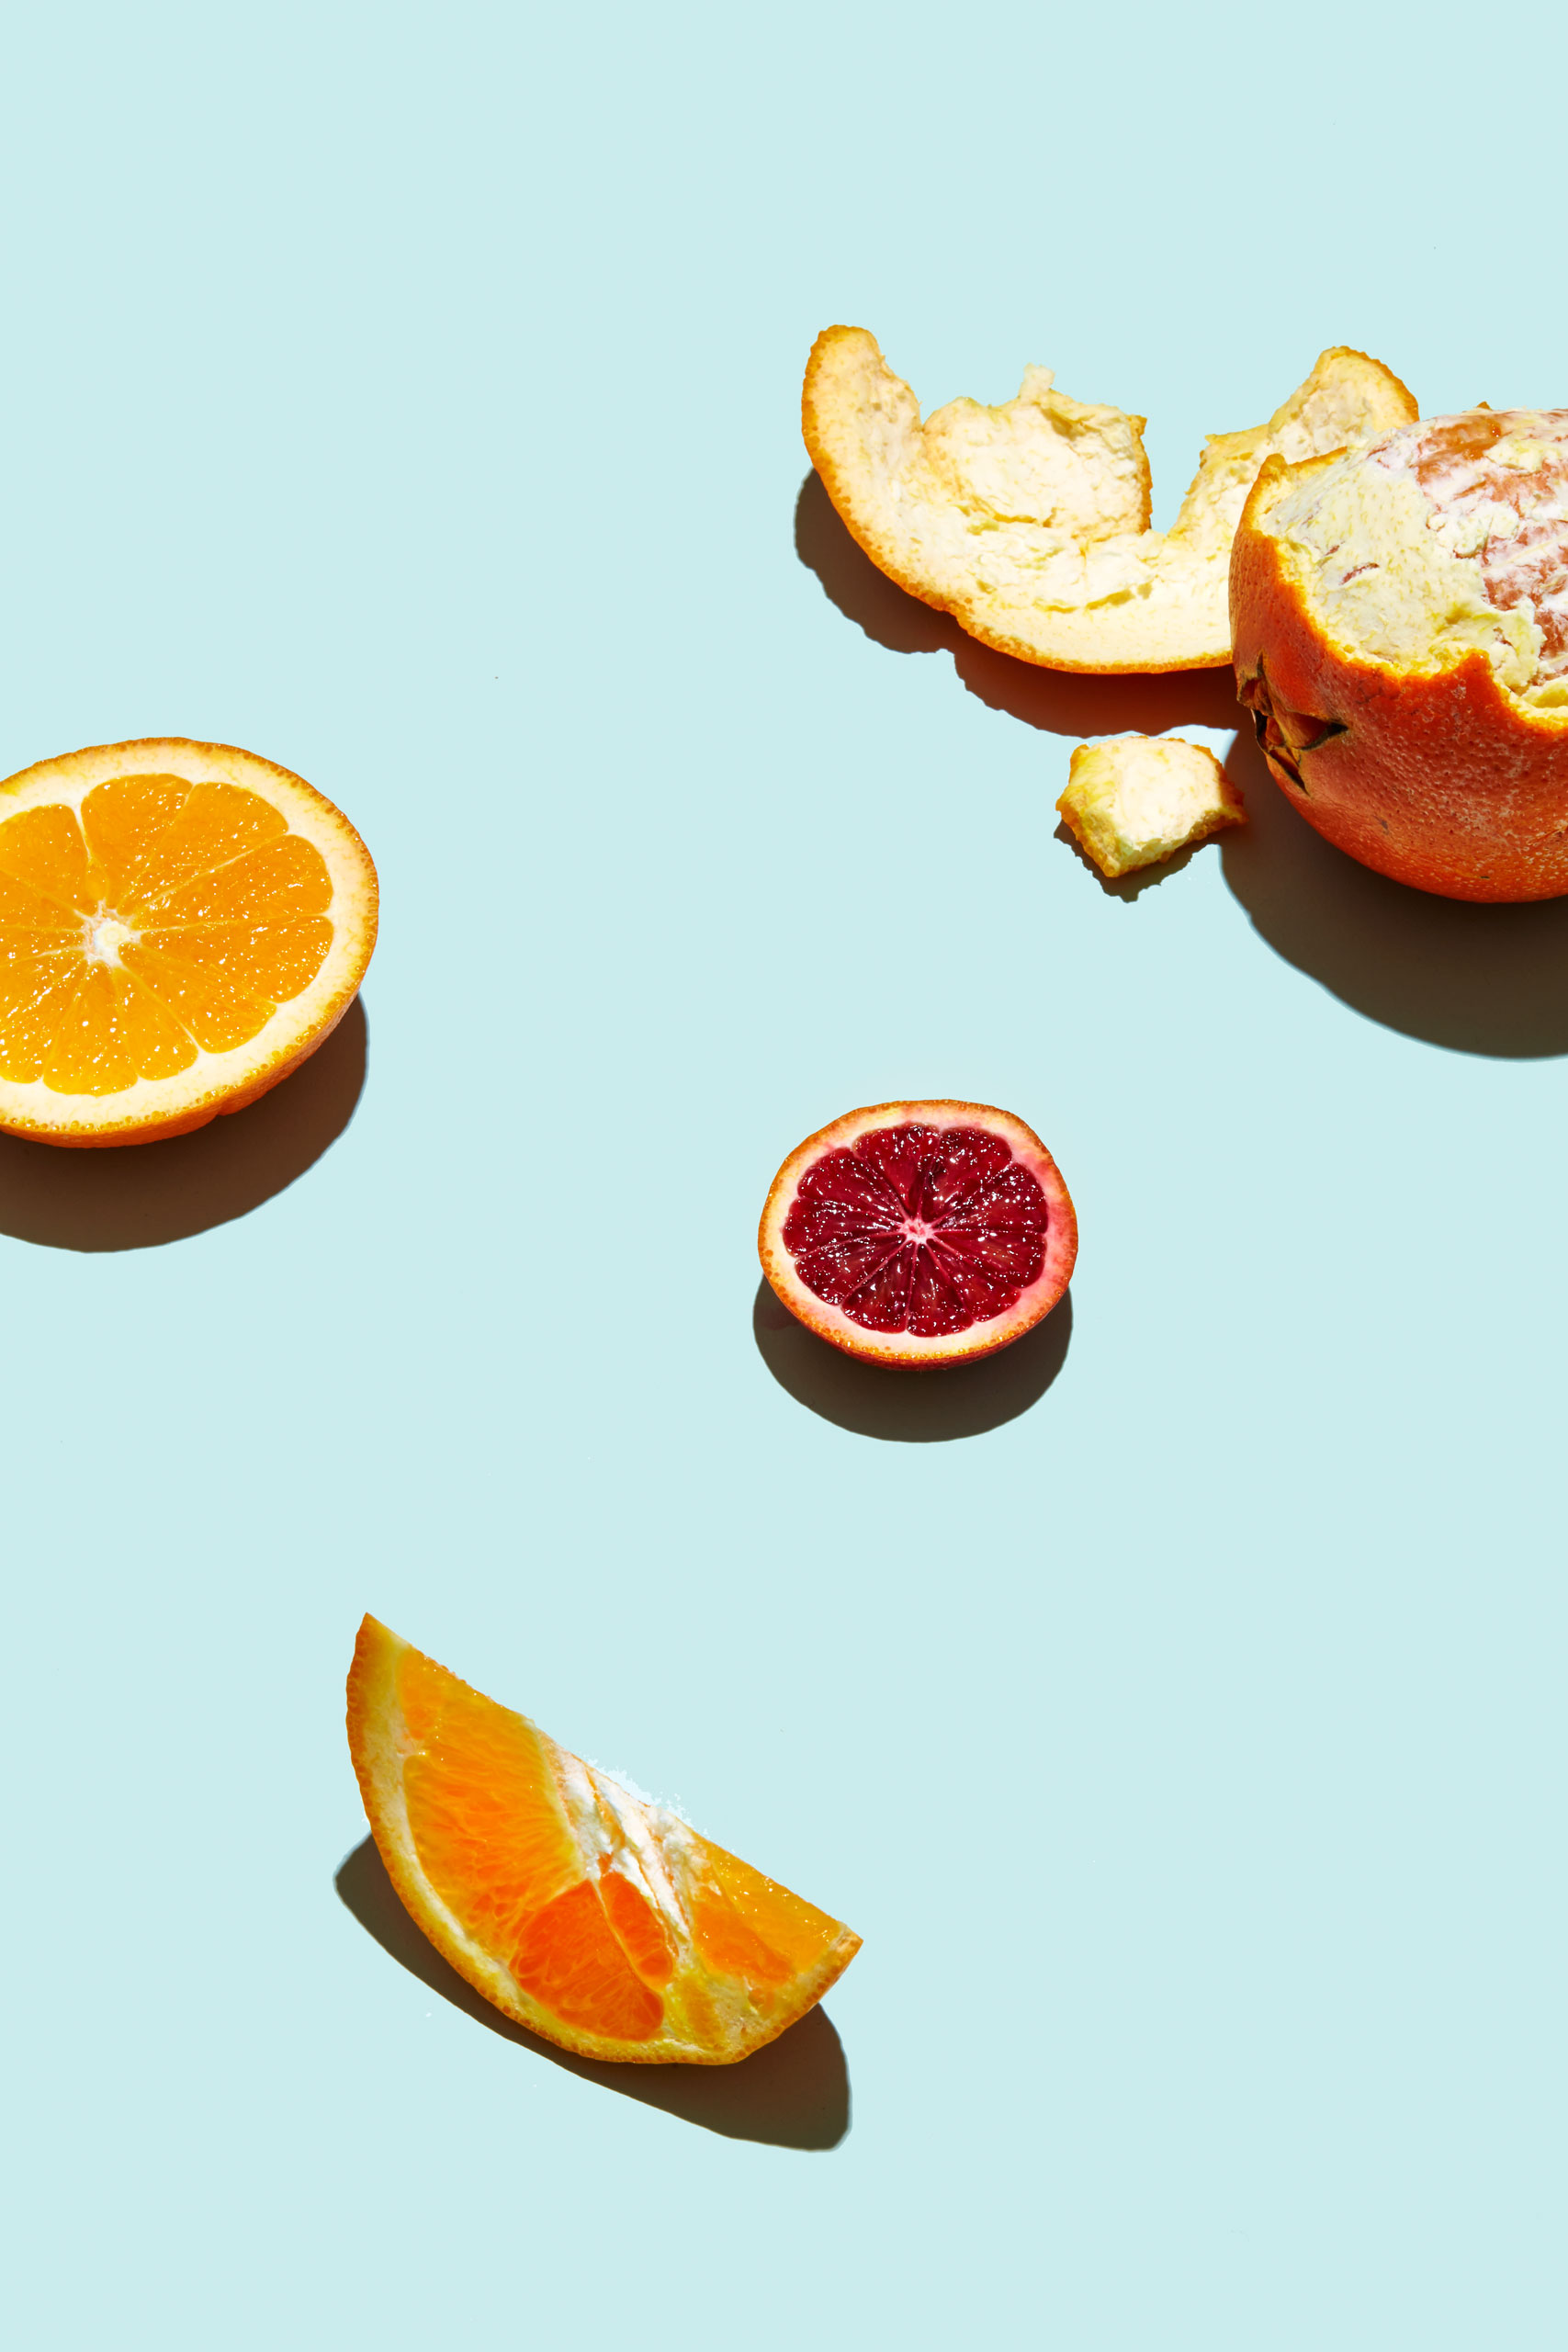 healthiest foods, health food, diet, nutrition, time.com stock, oranges, citrus